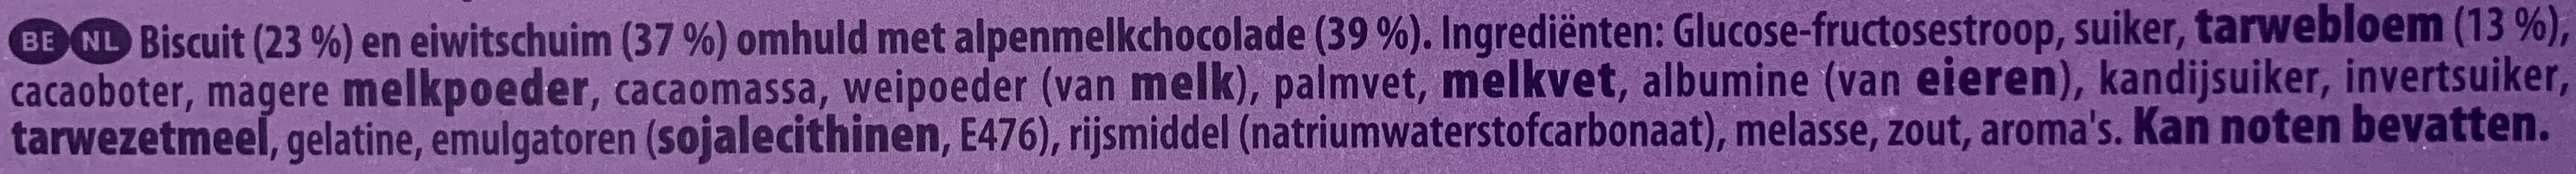 Melo Cakes - Ingrediënten - nl